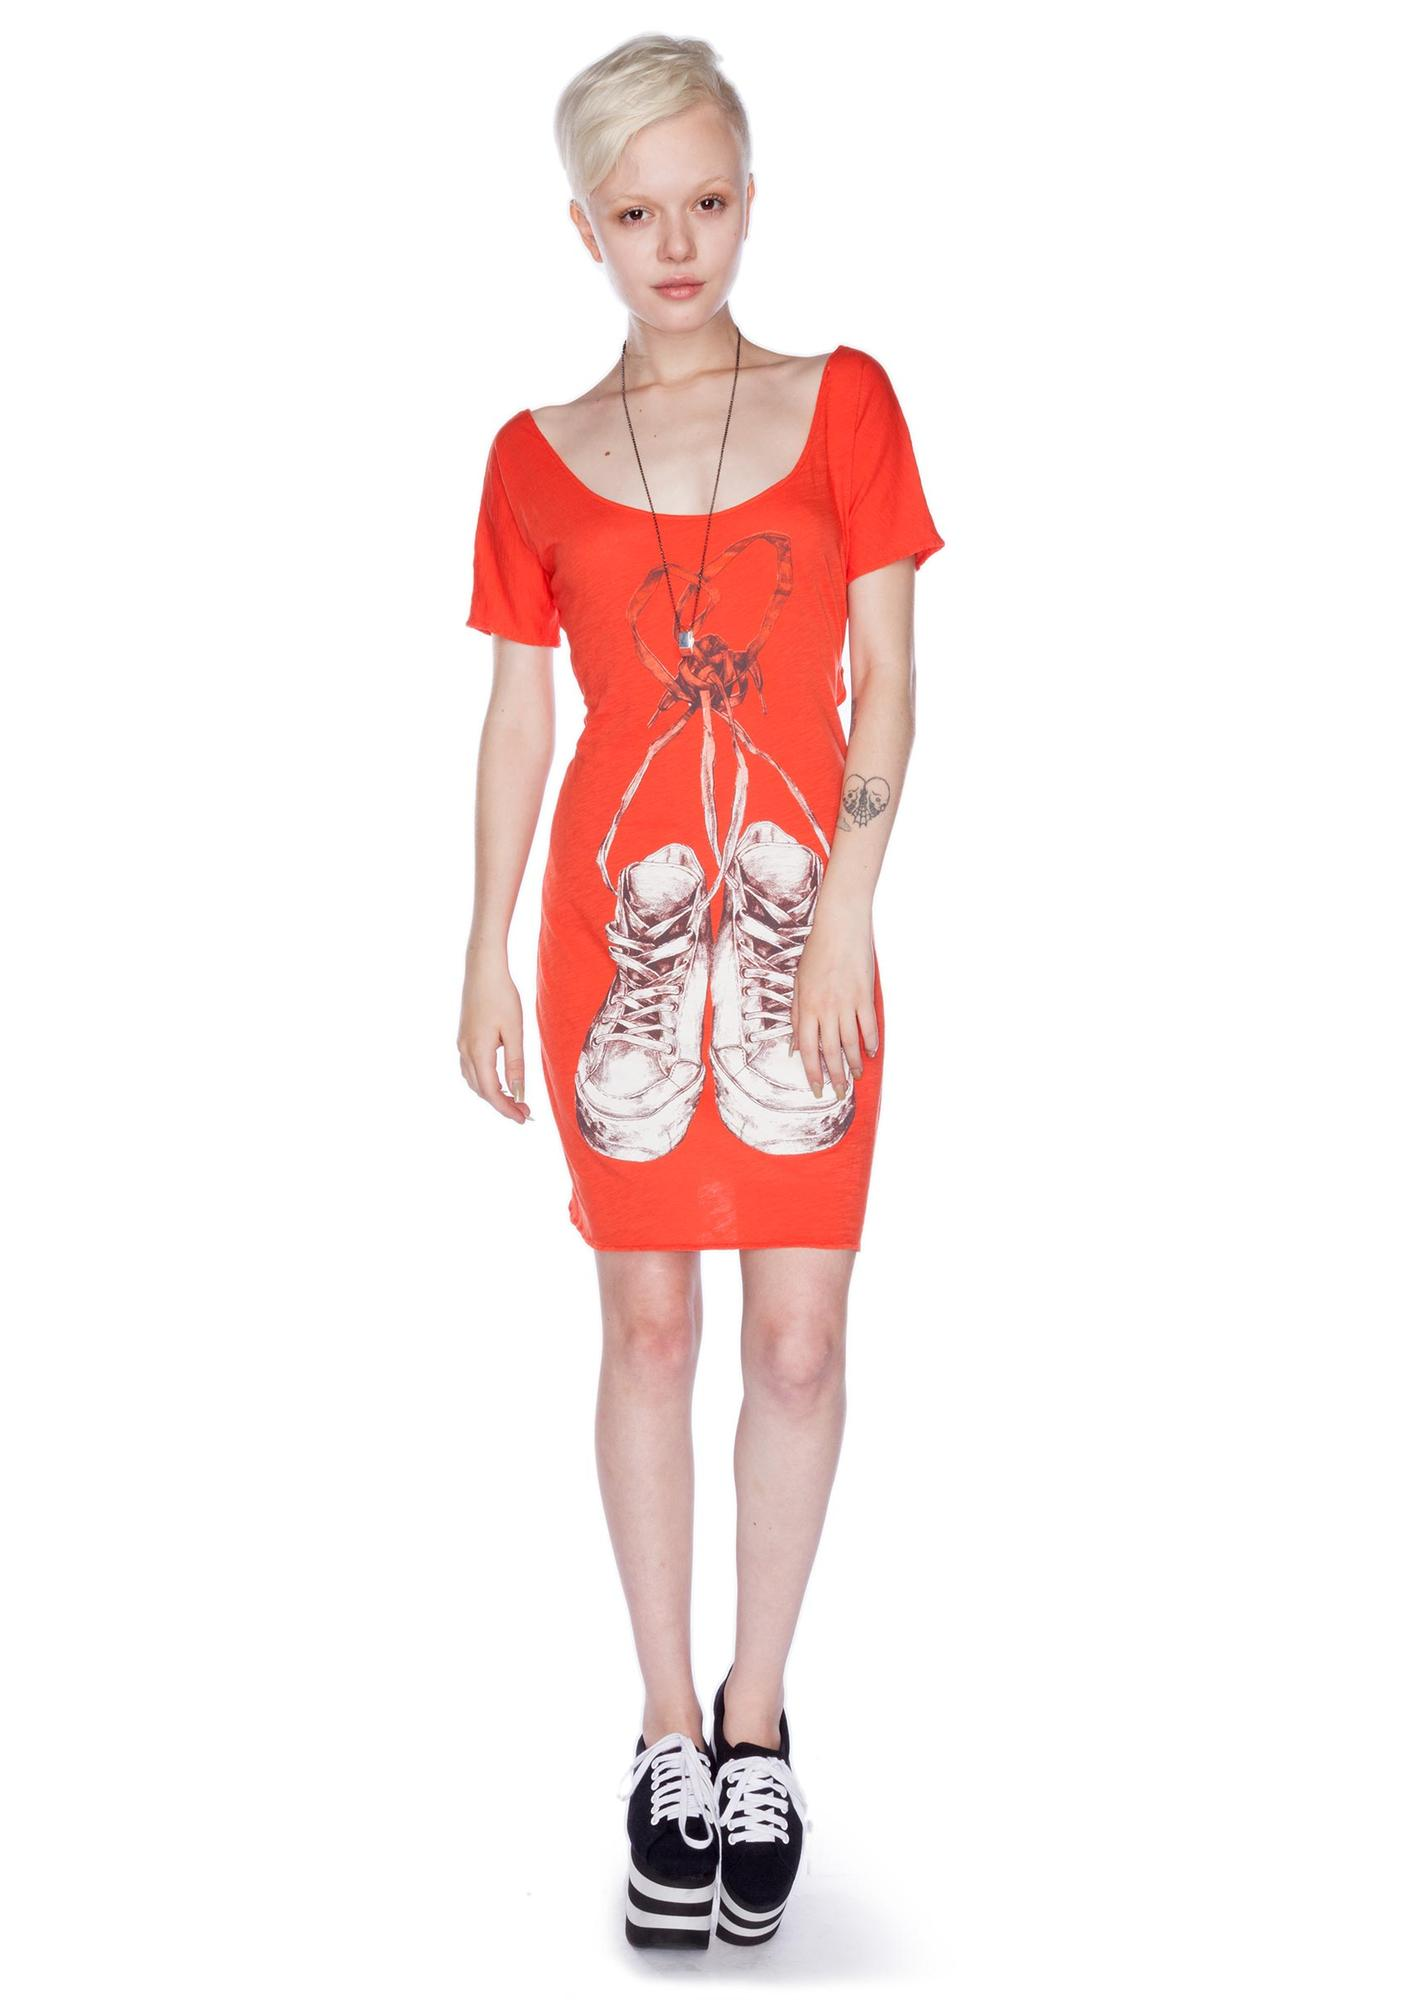 Laced Heart Dress